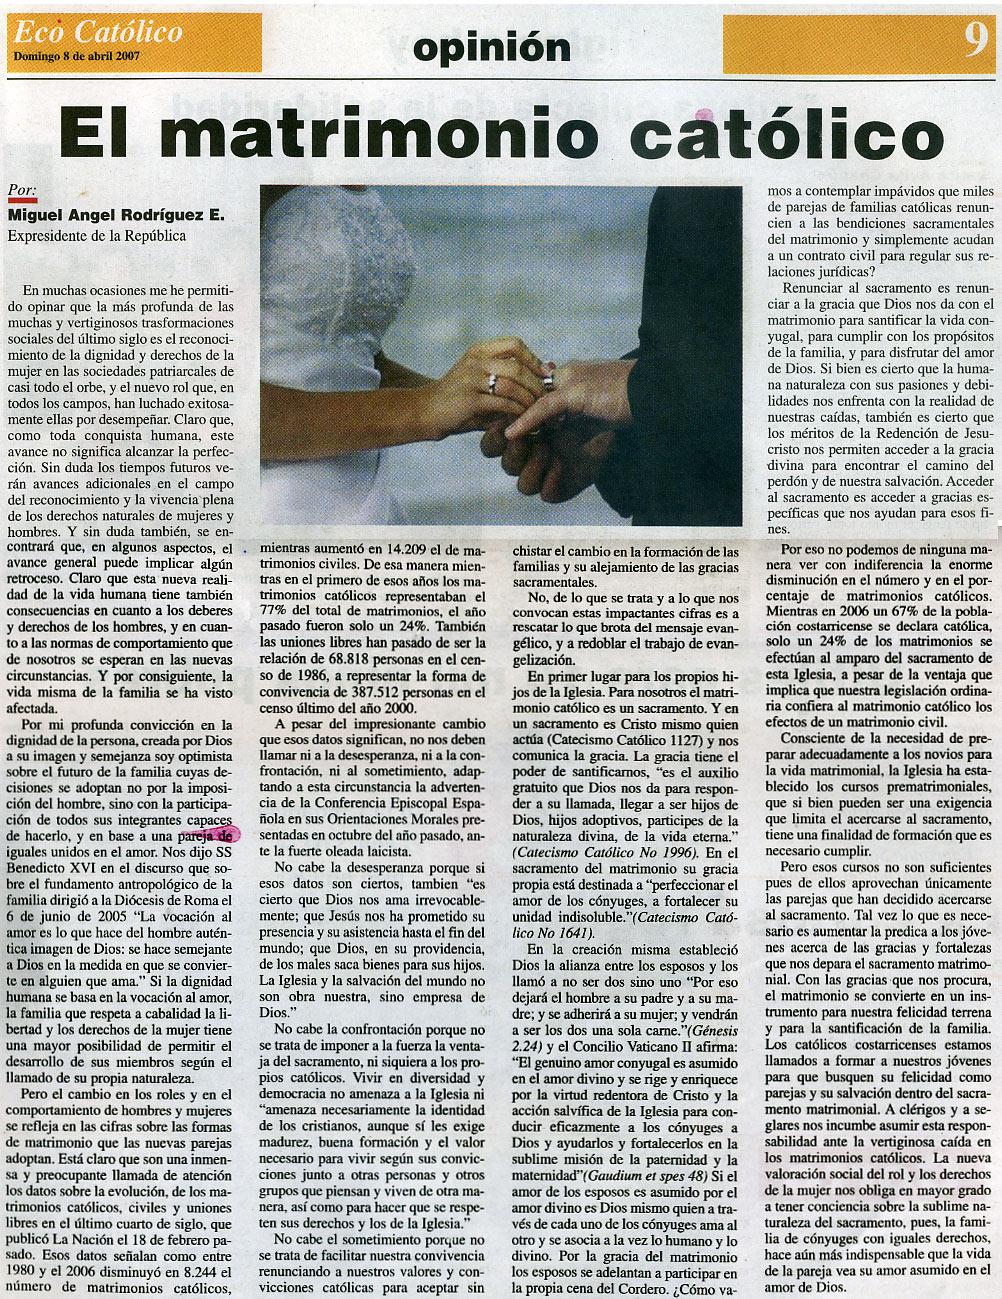 Oracion Del Matrimonio Catolico : El matrimonio catolico pictures to pin on pinterest